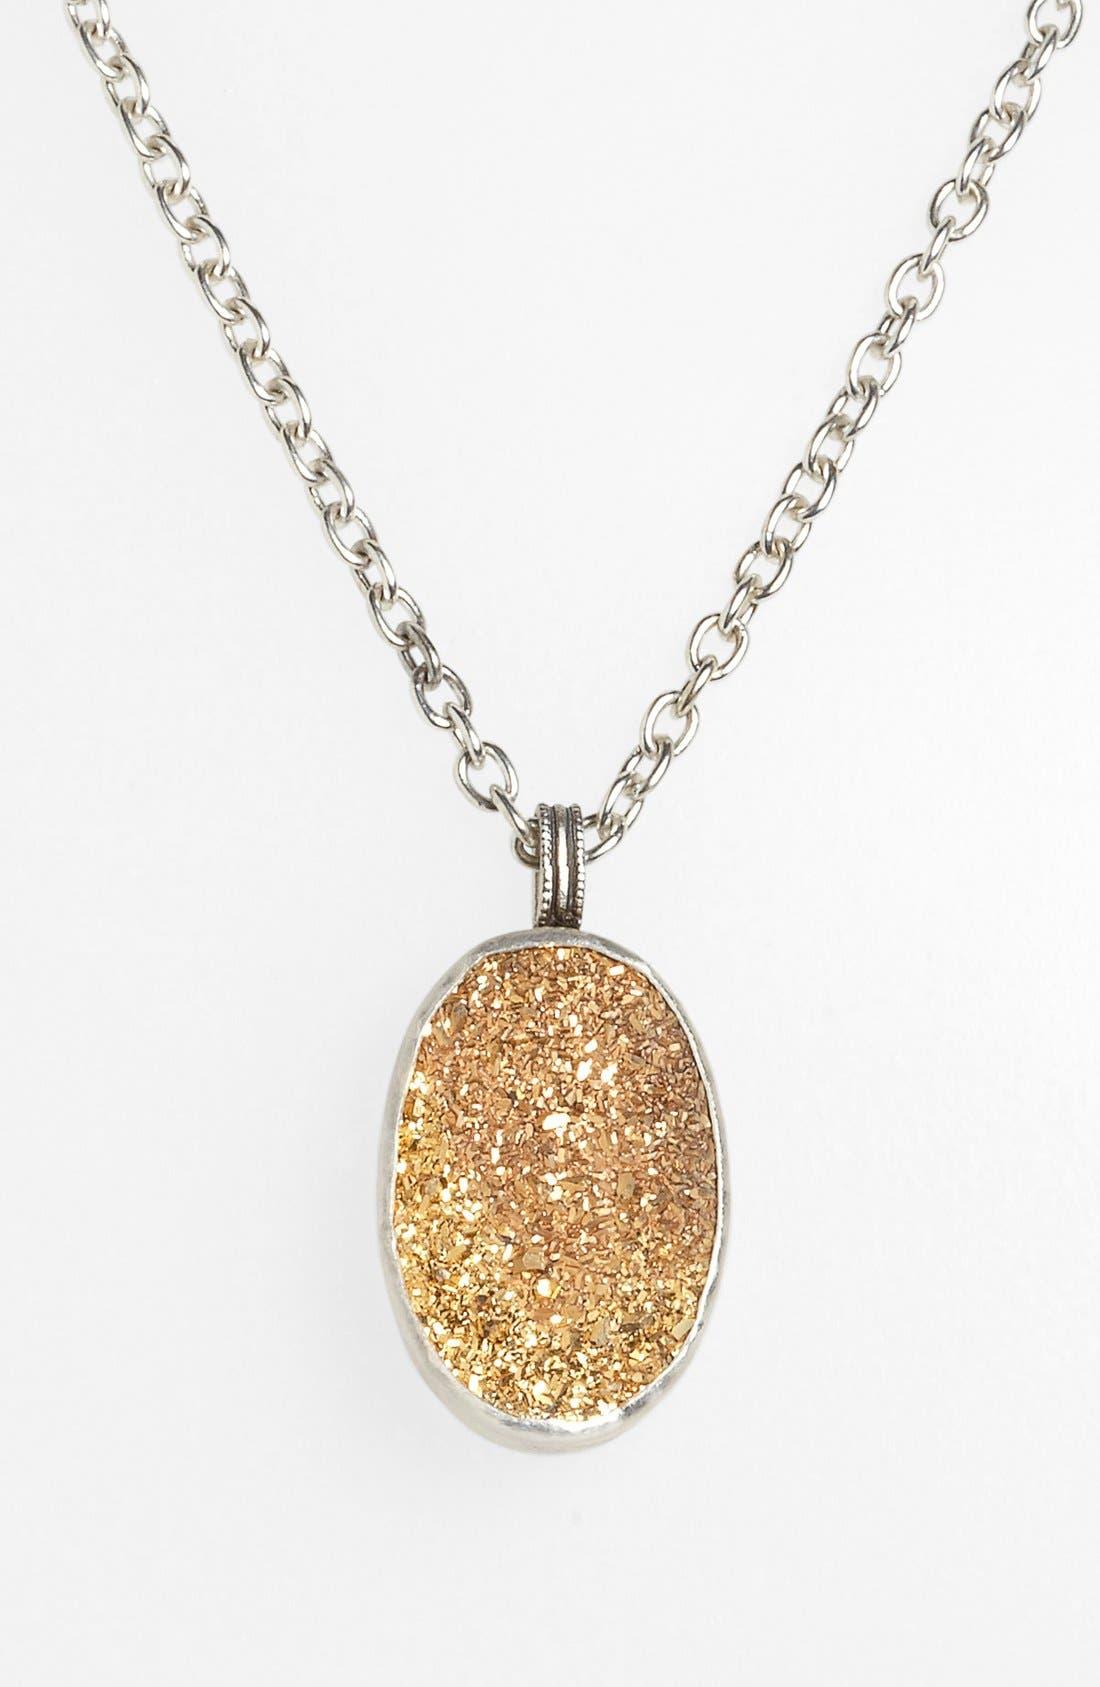 Main Image - Gurhan 'Galaxy' Drusy Pendant Necklace